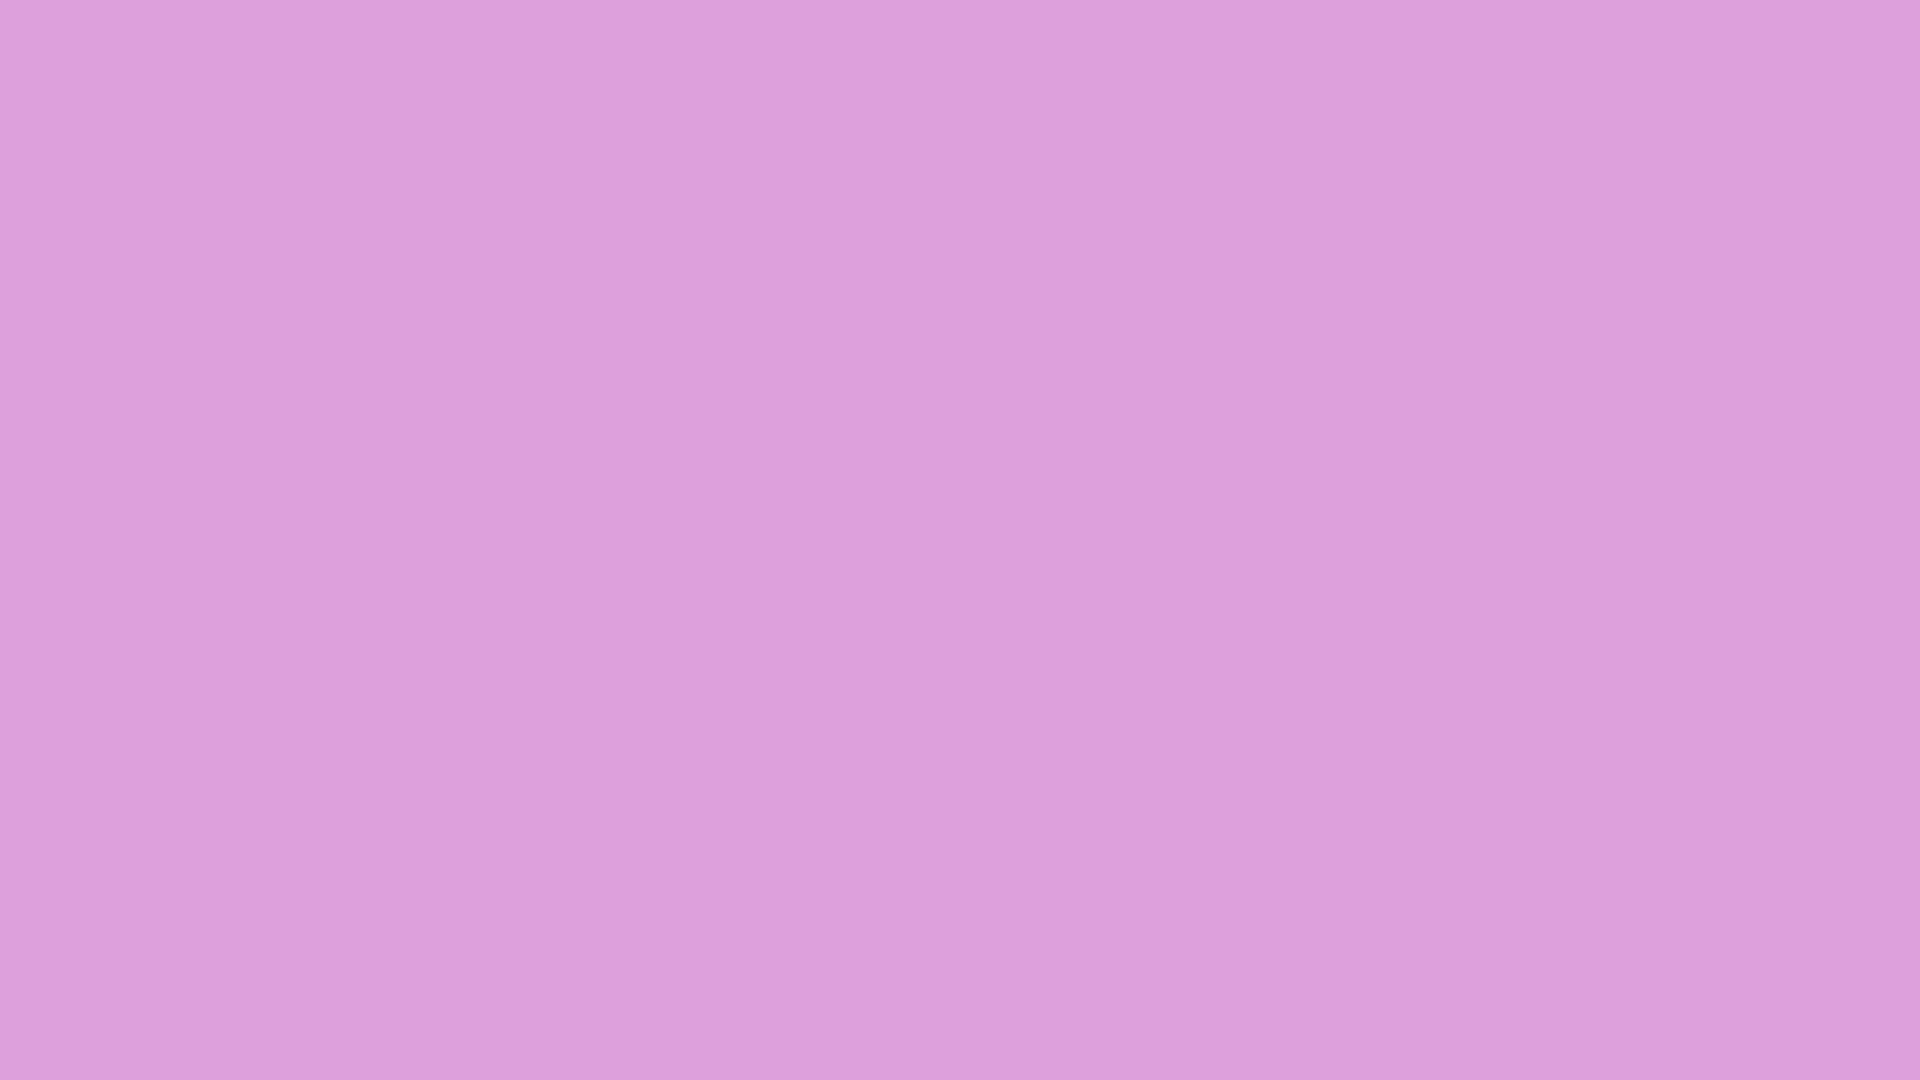 1920x1080 Plum Web Solid Color Background